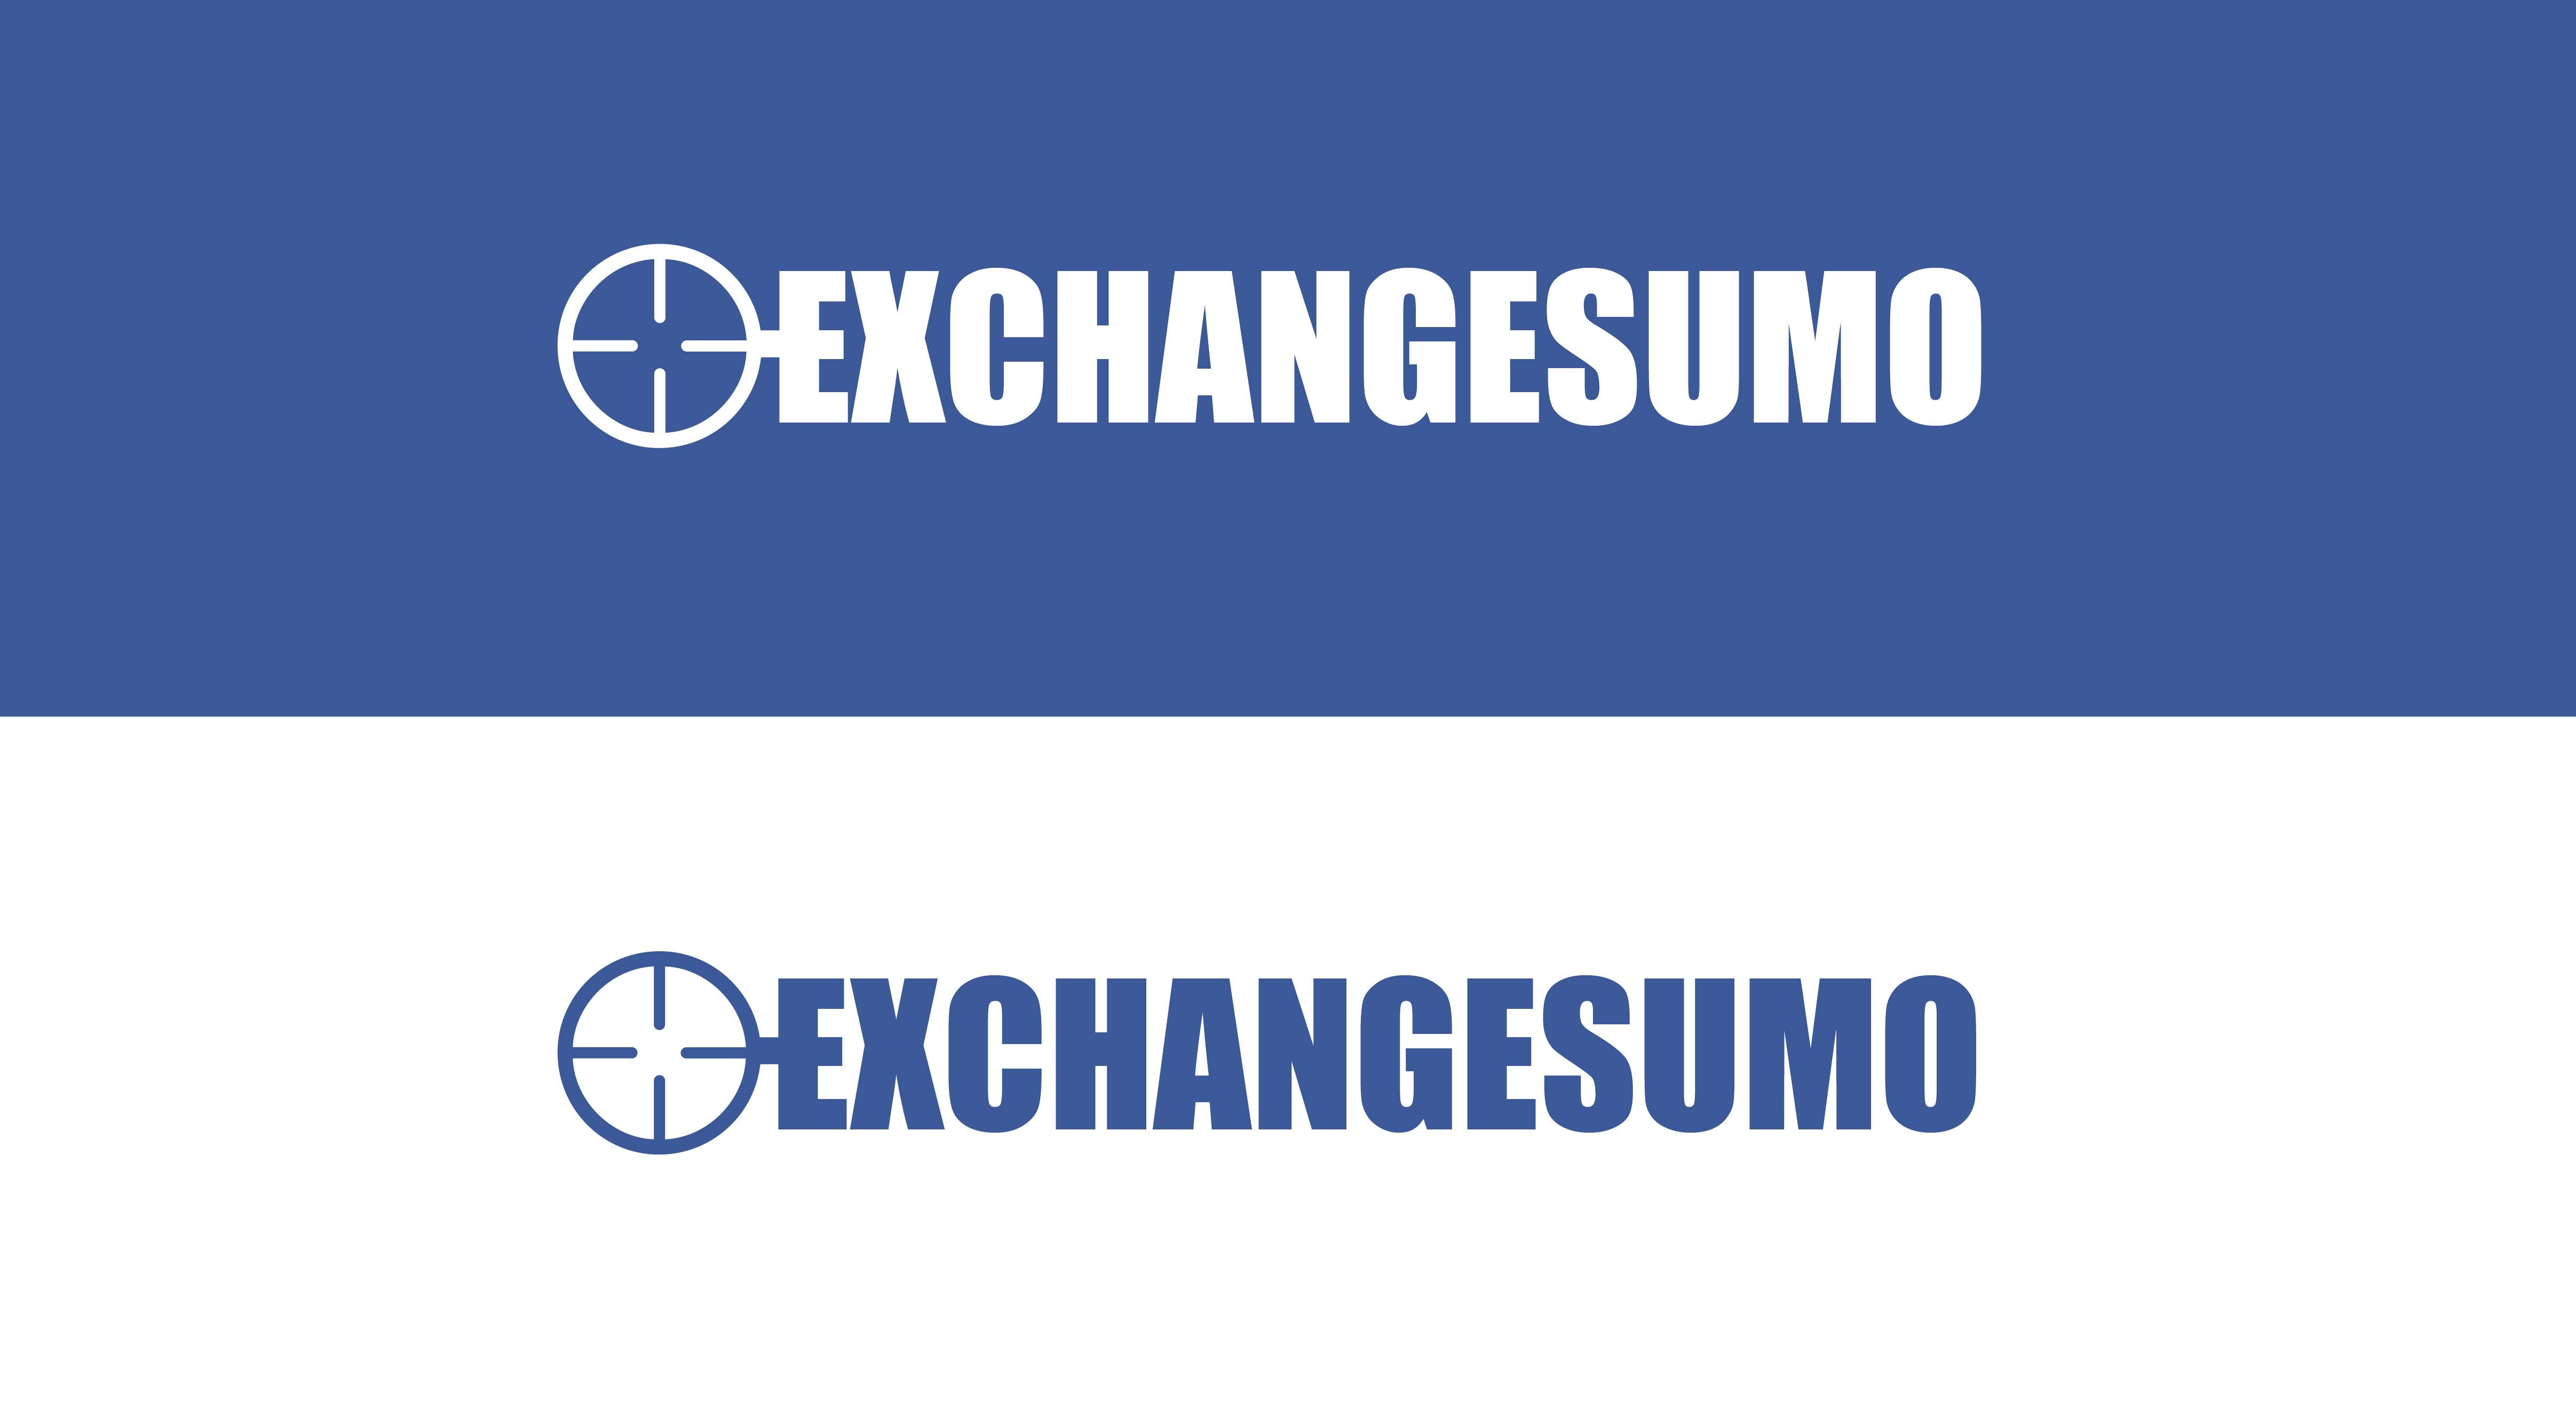 Логотип для мониторинга обменников фото f_1105baa502d6cb9d.jpg